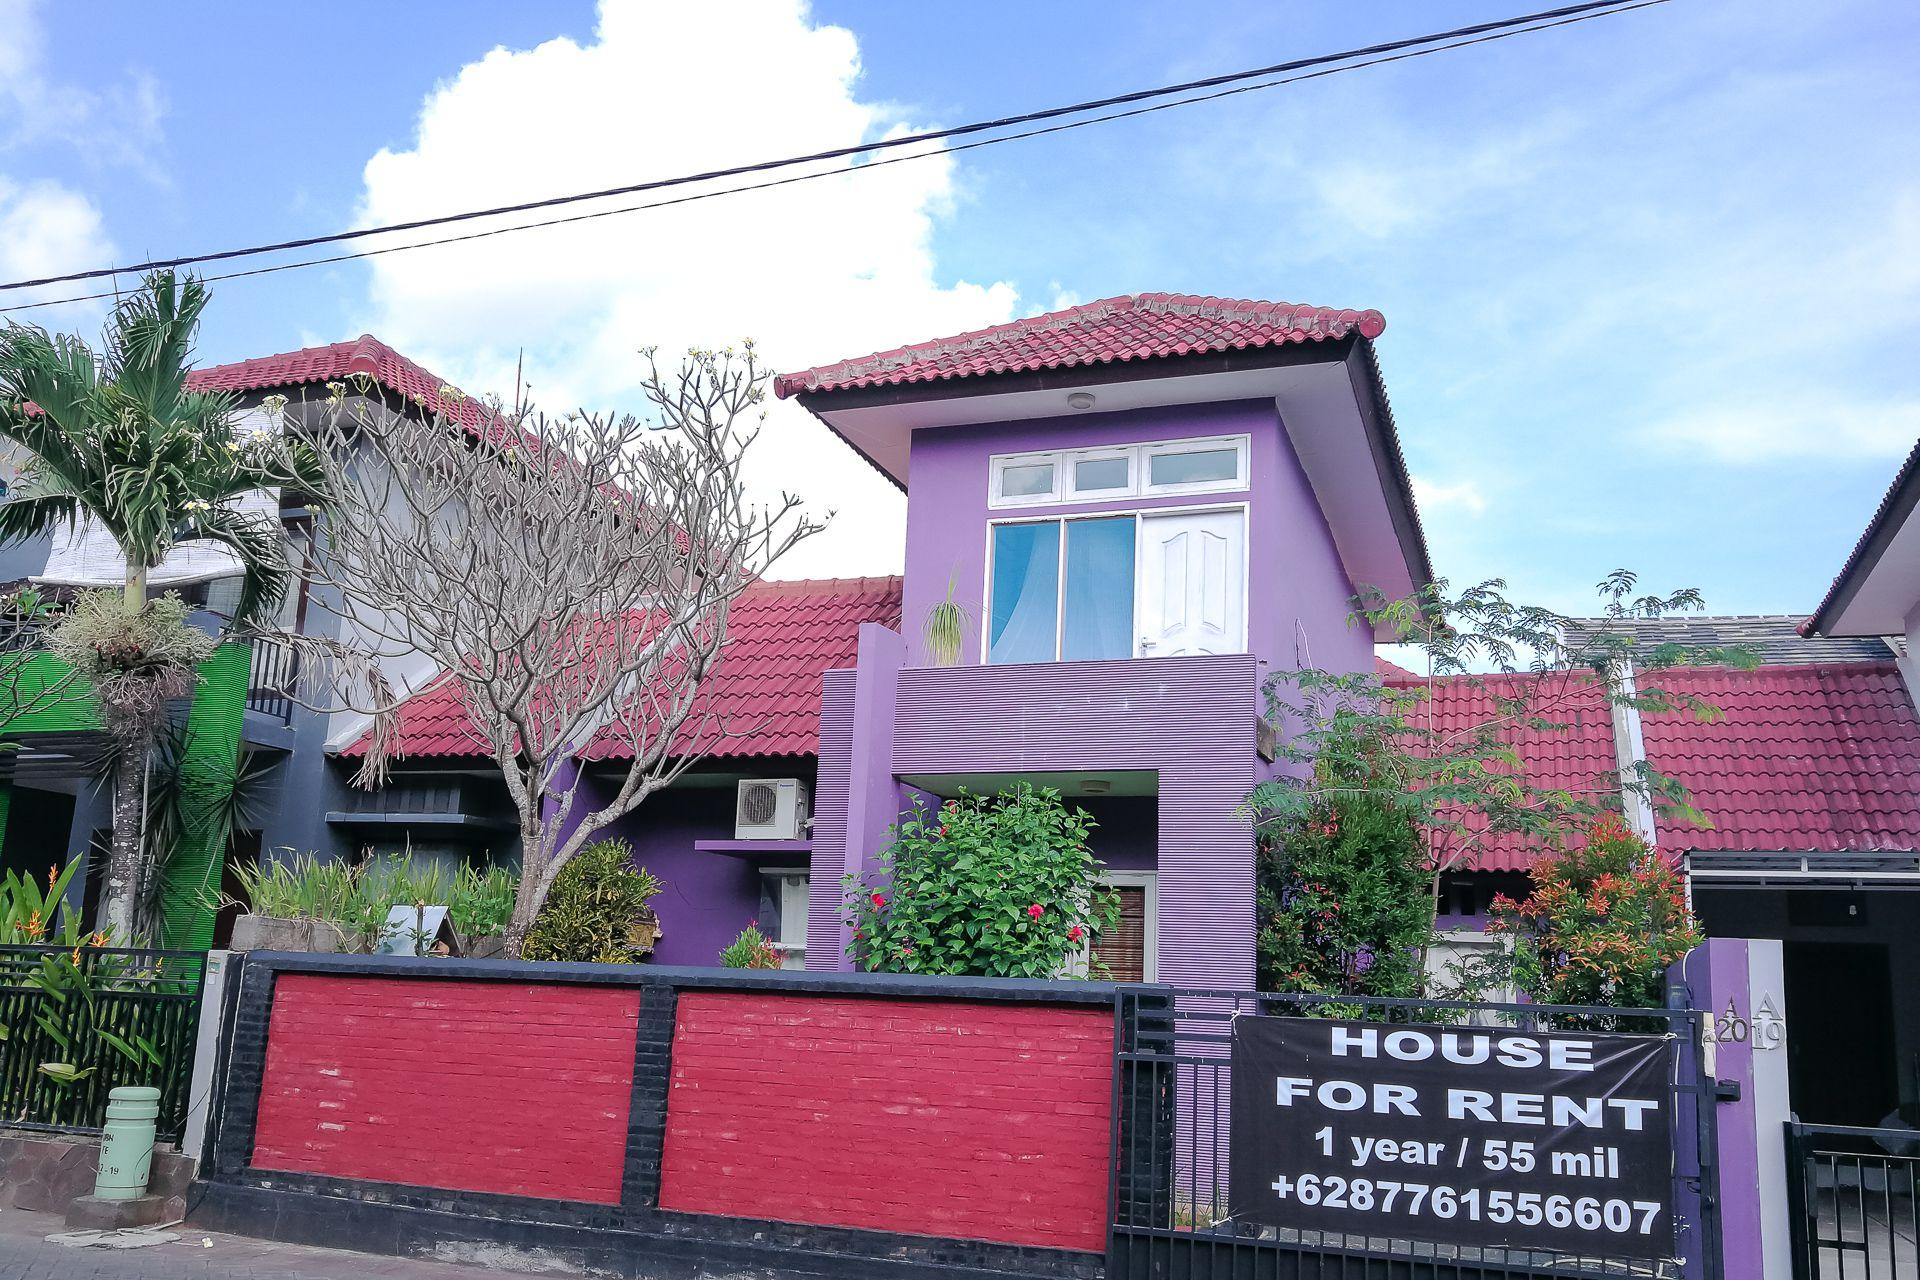 Гринлот поселок Бали, Гринлот, Greenlot ,Бали, жилье на Бали, поиск дома на Бали, дом на Бали, аренда дома на Бали, аренда жилья на Бали, аренда виллы на Бали, вилла Бали, отель Бали, снять дом на Бали, сколько стоит жилье на Бали, как найти дом на Бали, как снять комнату на Бали, как снять виллу на Бали, жилой поселок на Бали, отзывы об аренде жилья на Бали, Bali rent house,